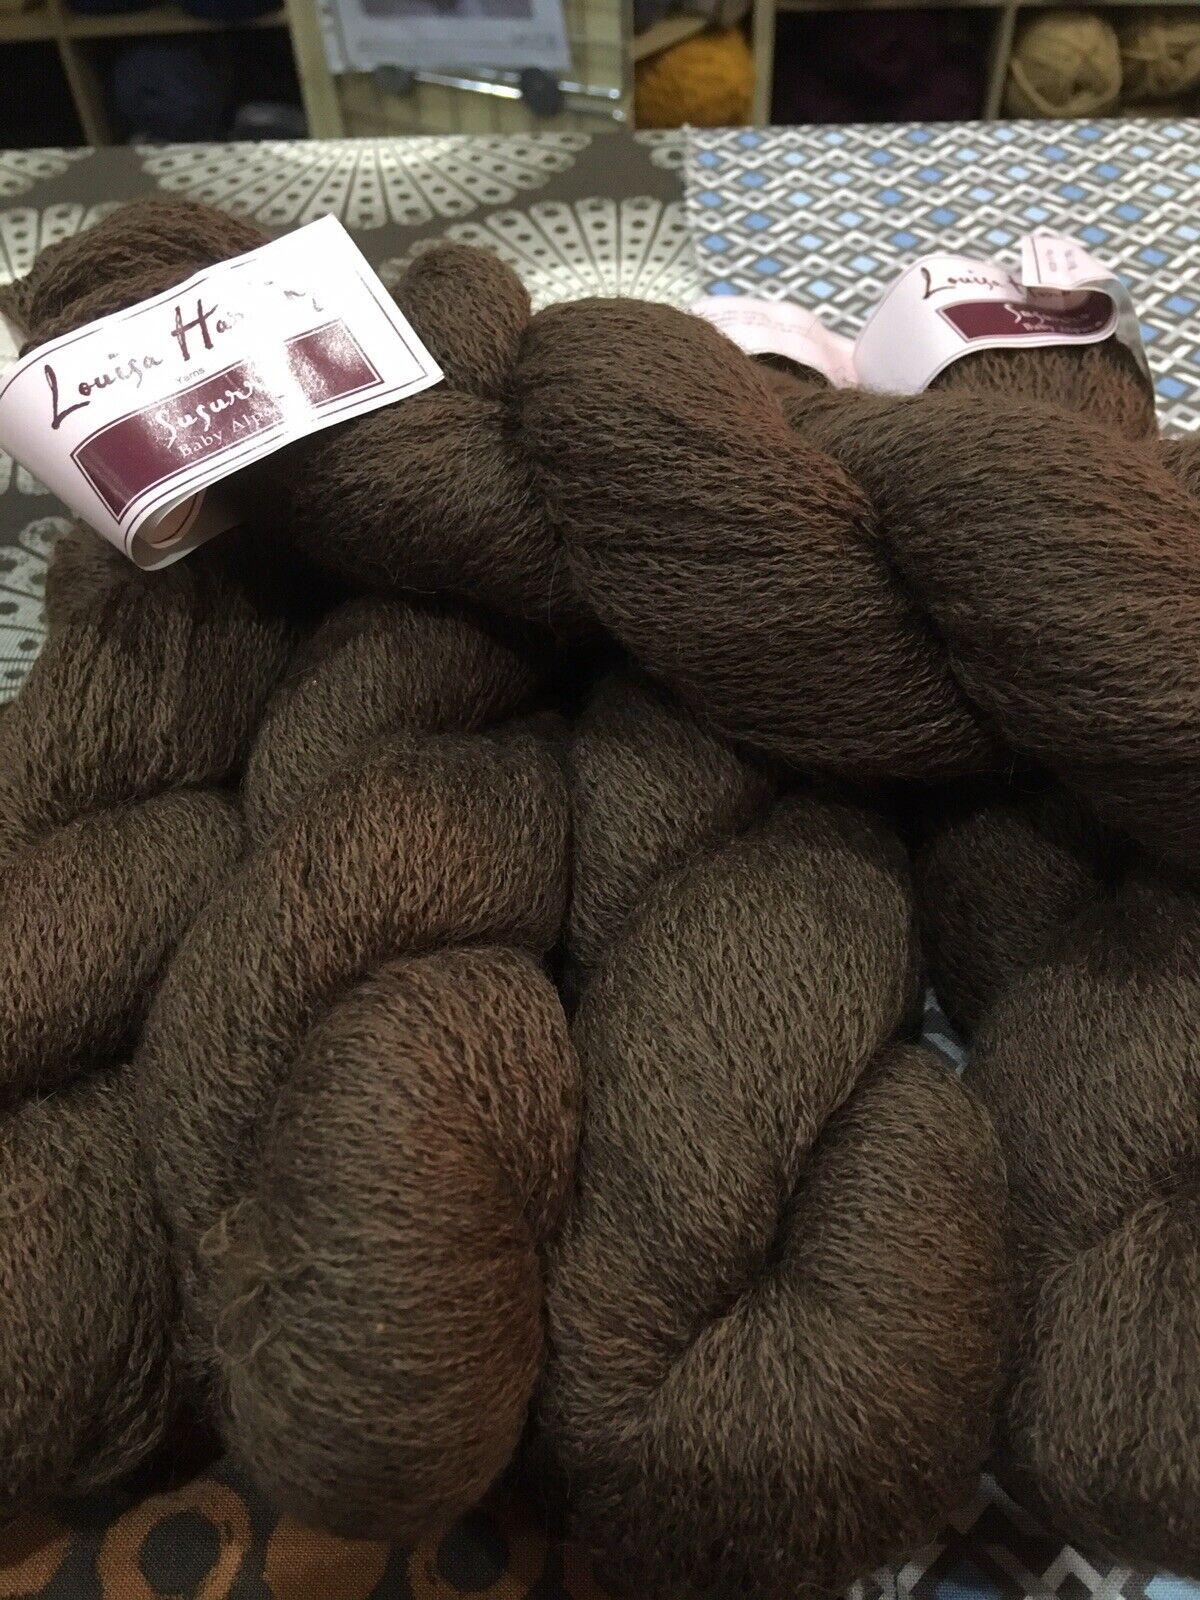 Louisa Harding Luzia Fur Effect Yarn #03//Amber 3 x 50g Balls